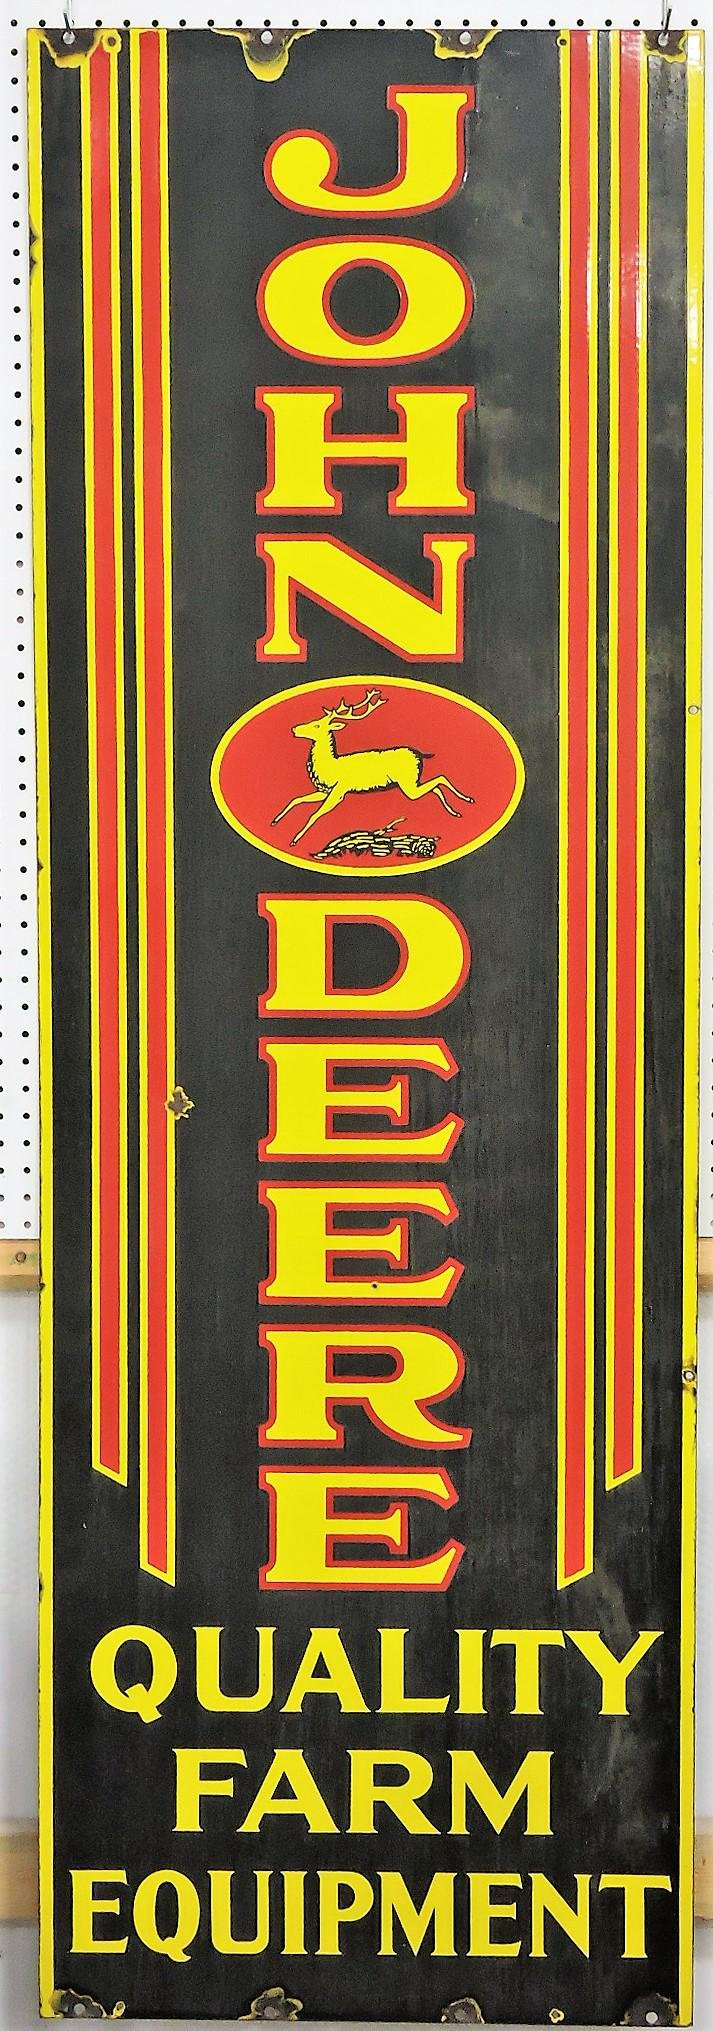 John Deere Quality Farm Equipment